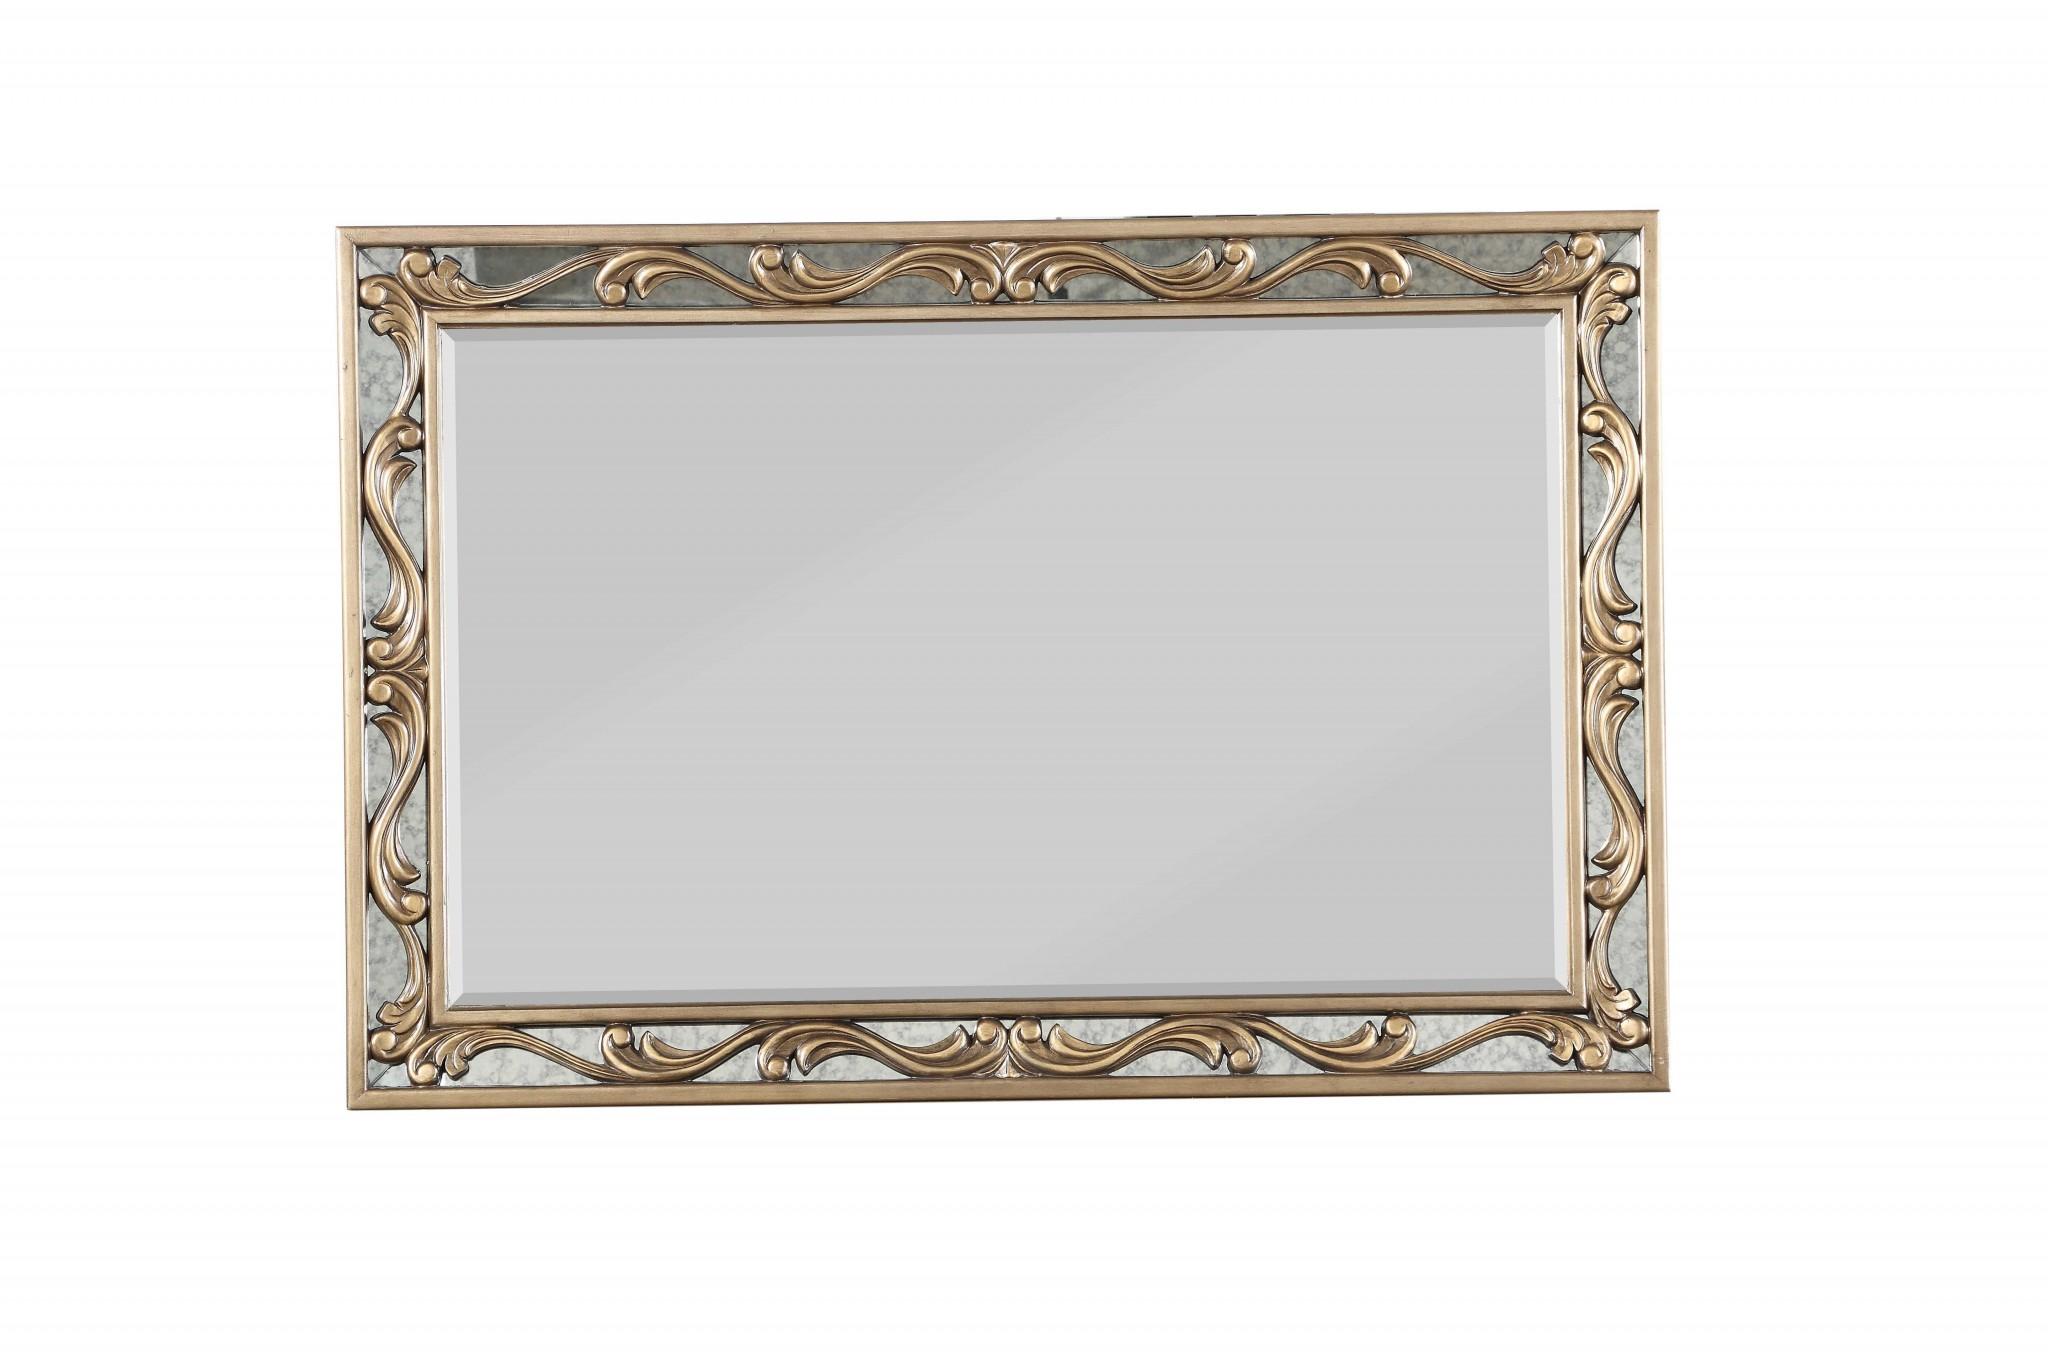 "2"" X 48"" X 32"" Antique Gold Wood Mirror"